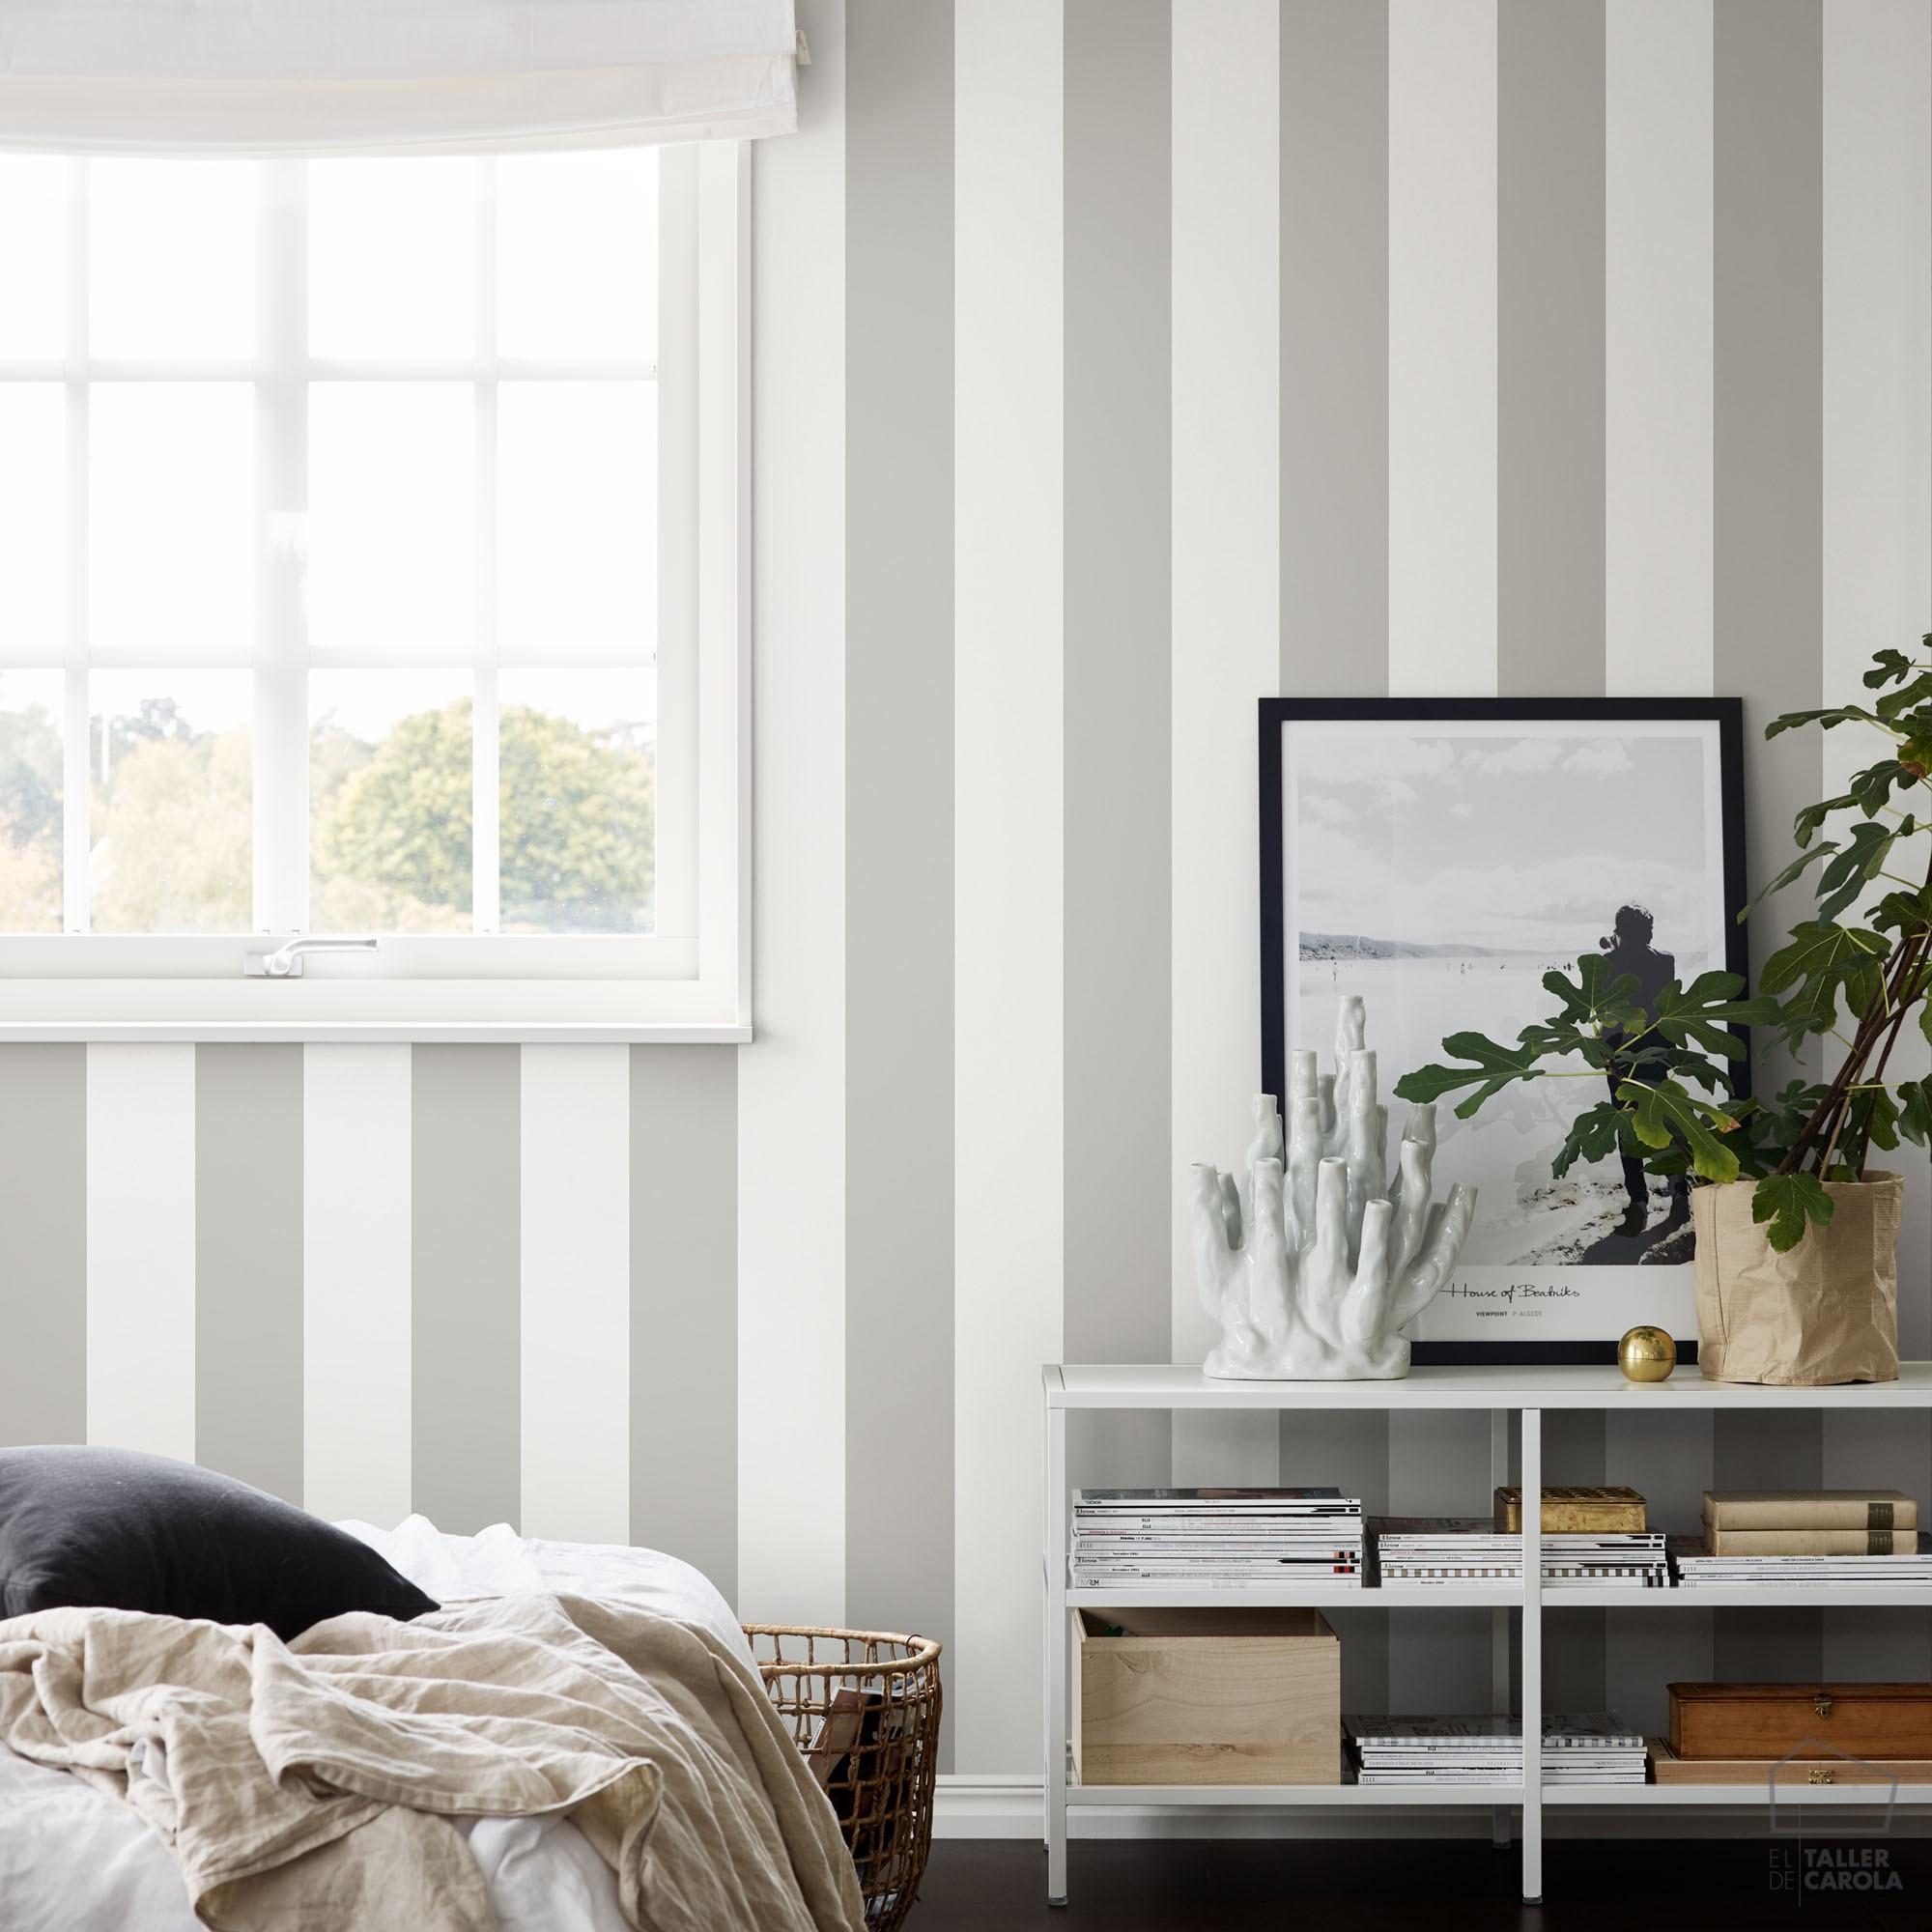 Papel pintado rayas gris oscuro el taller de carola - Papel pared rayas verticales ...